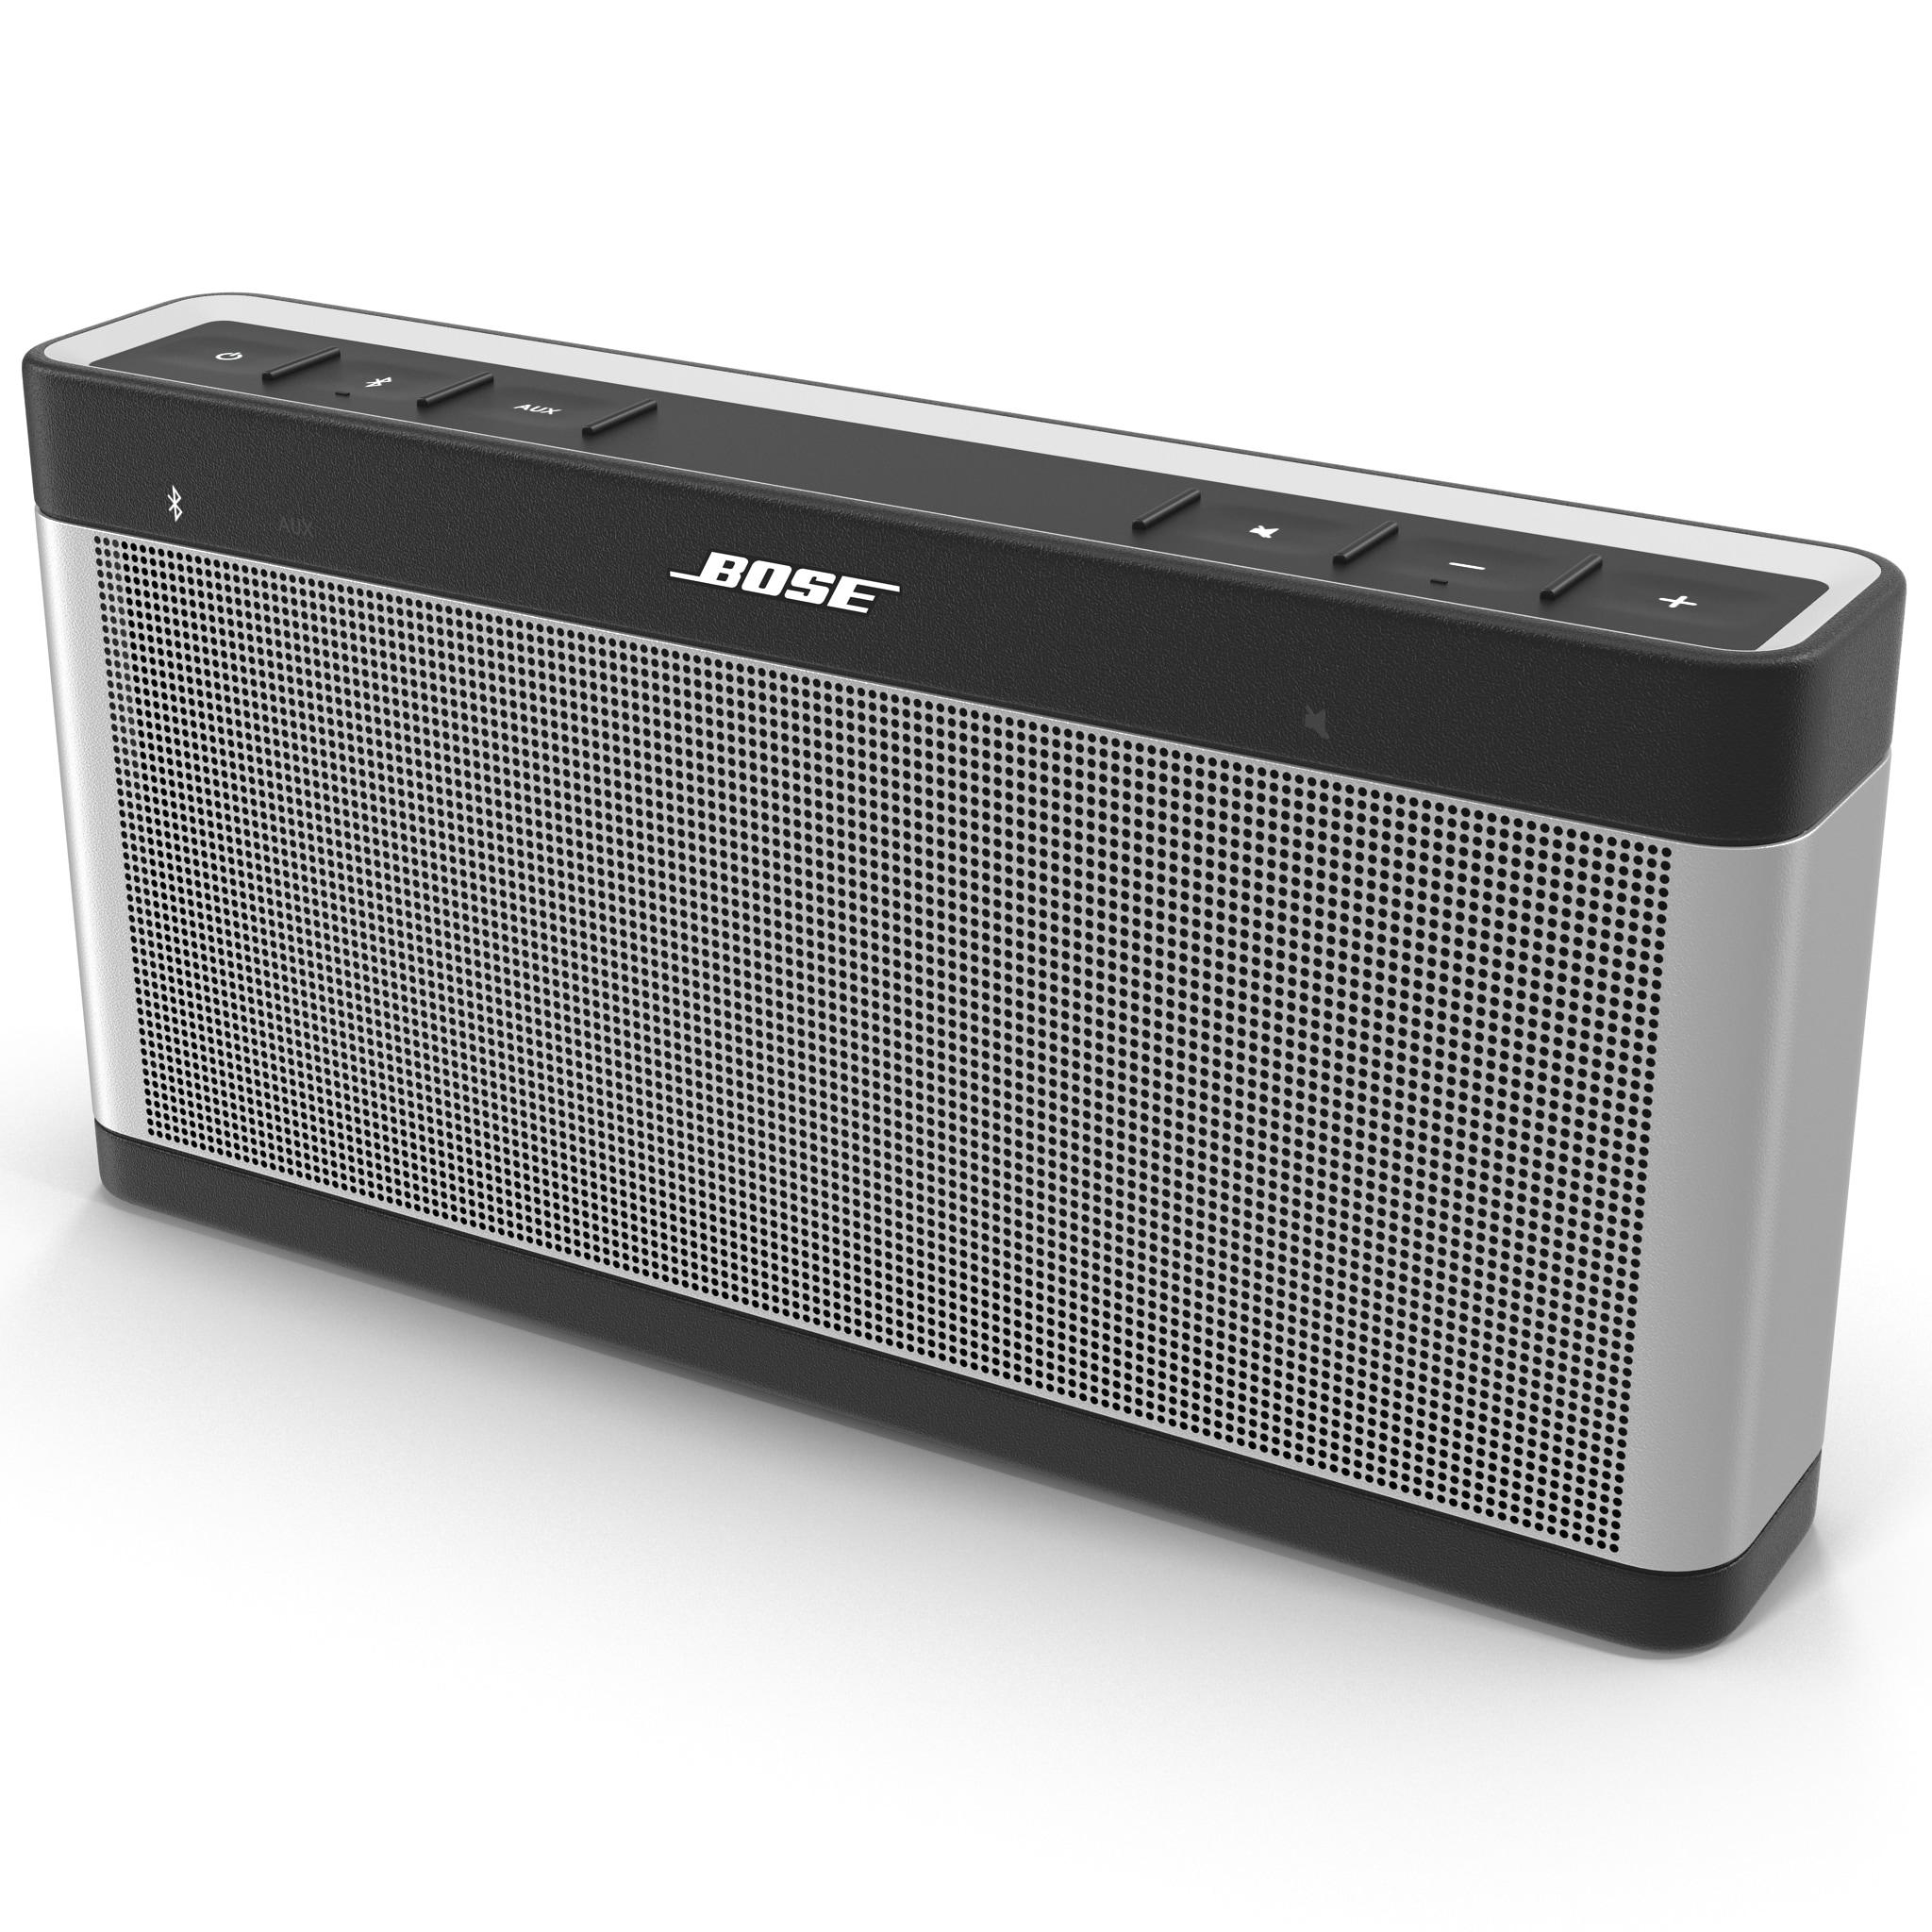 000_Bose_SoundLink_Bluetooth_Speaker_.jpg